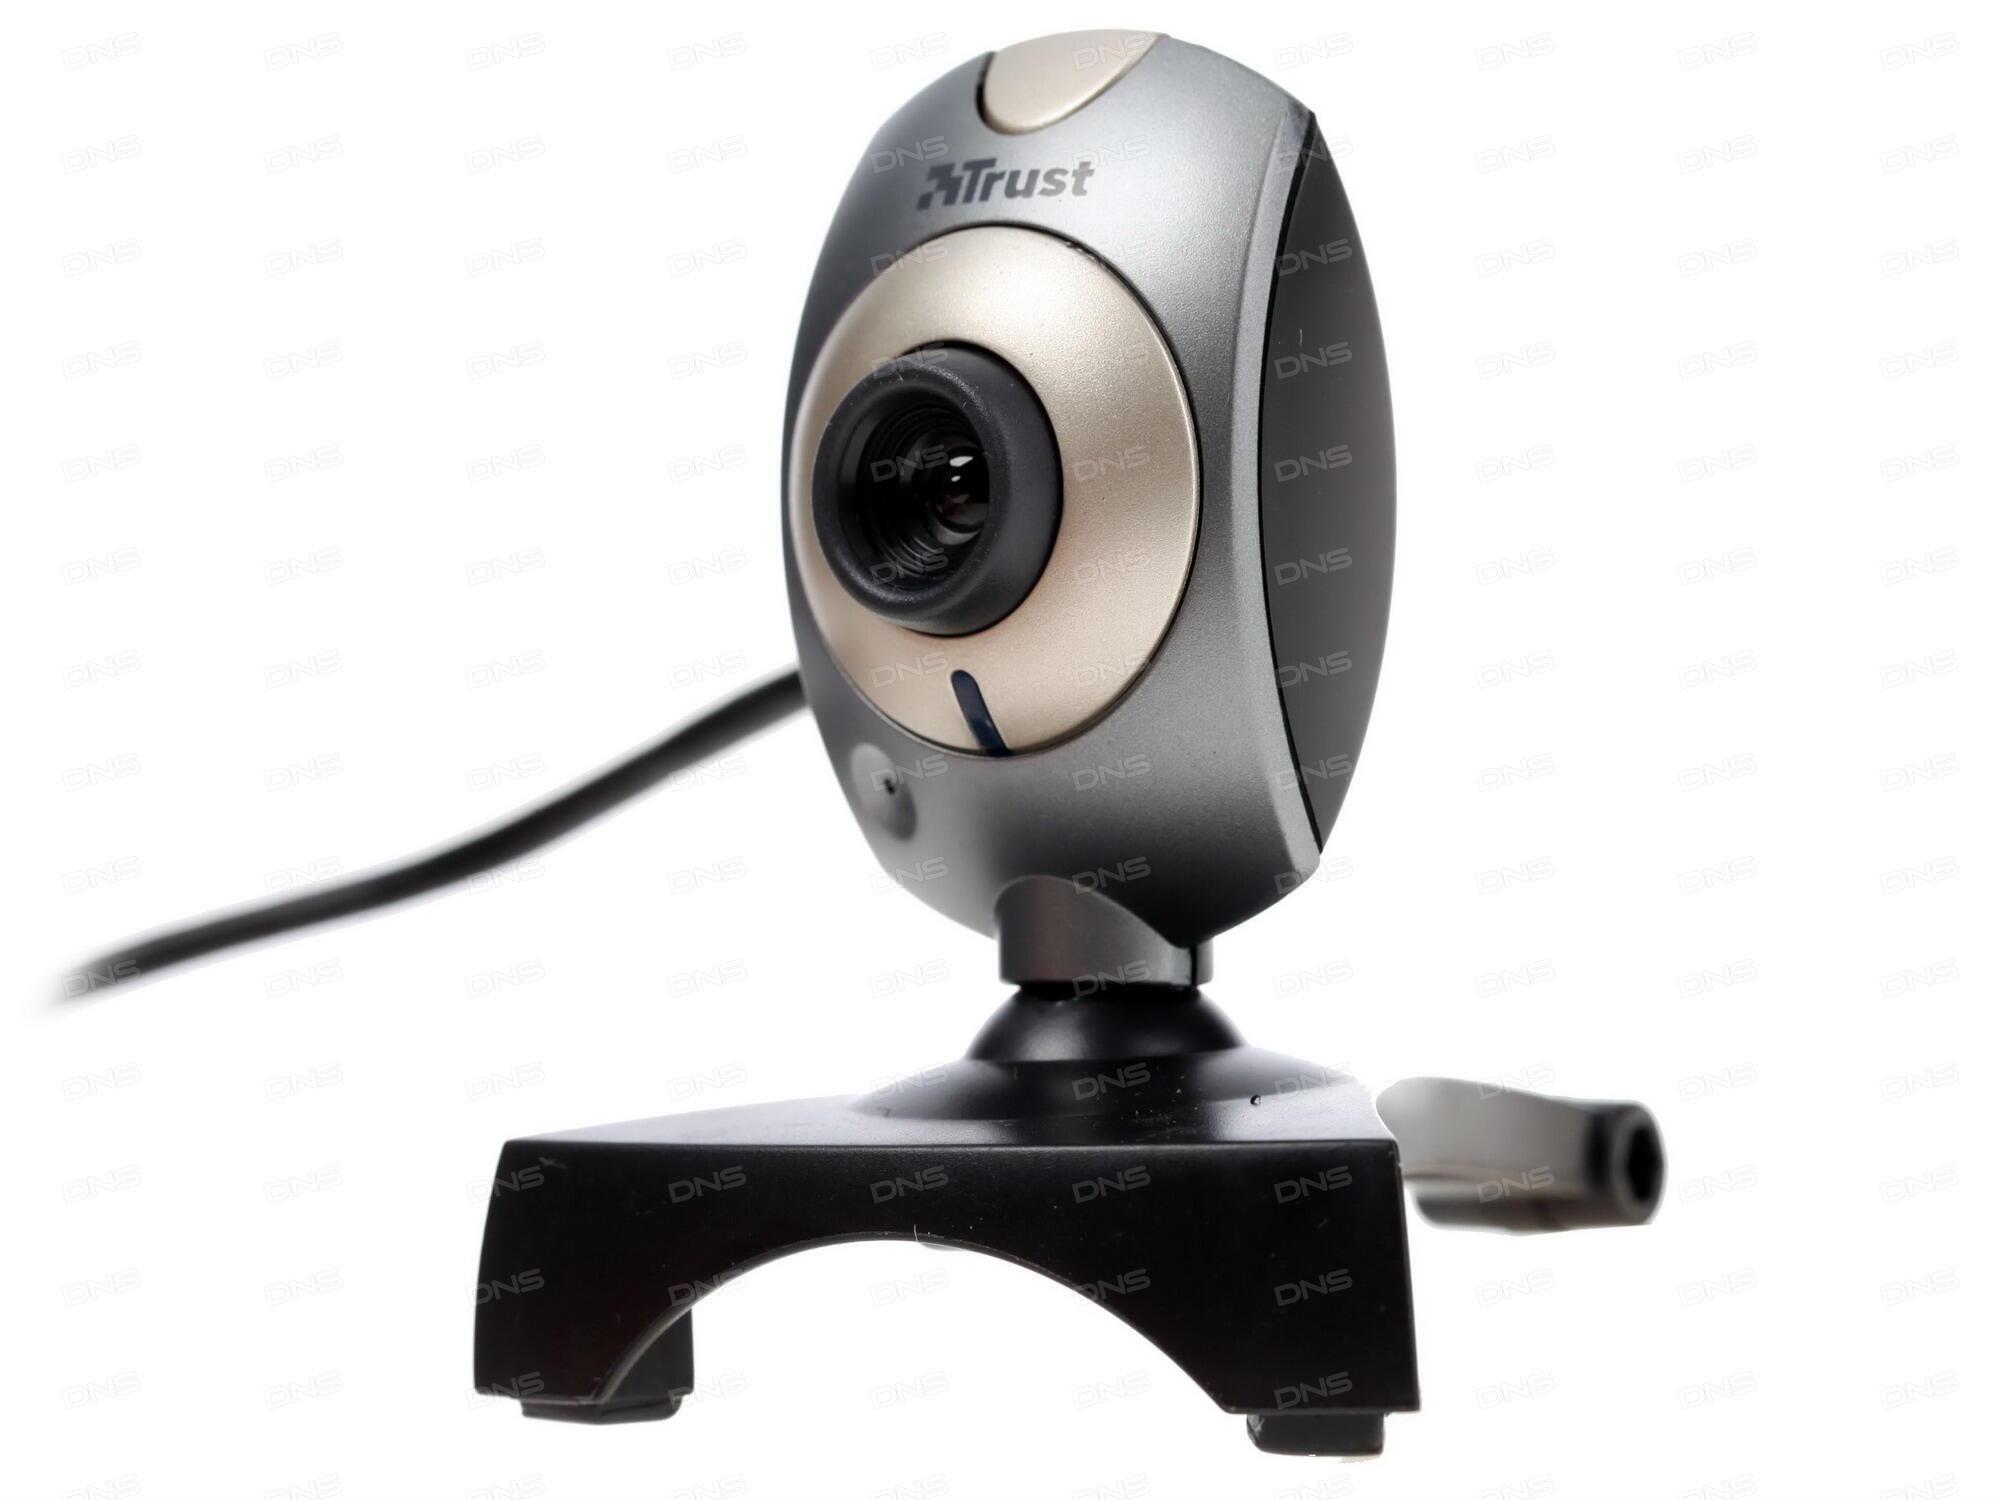 Trust ceptor hd video webcam